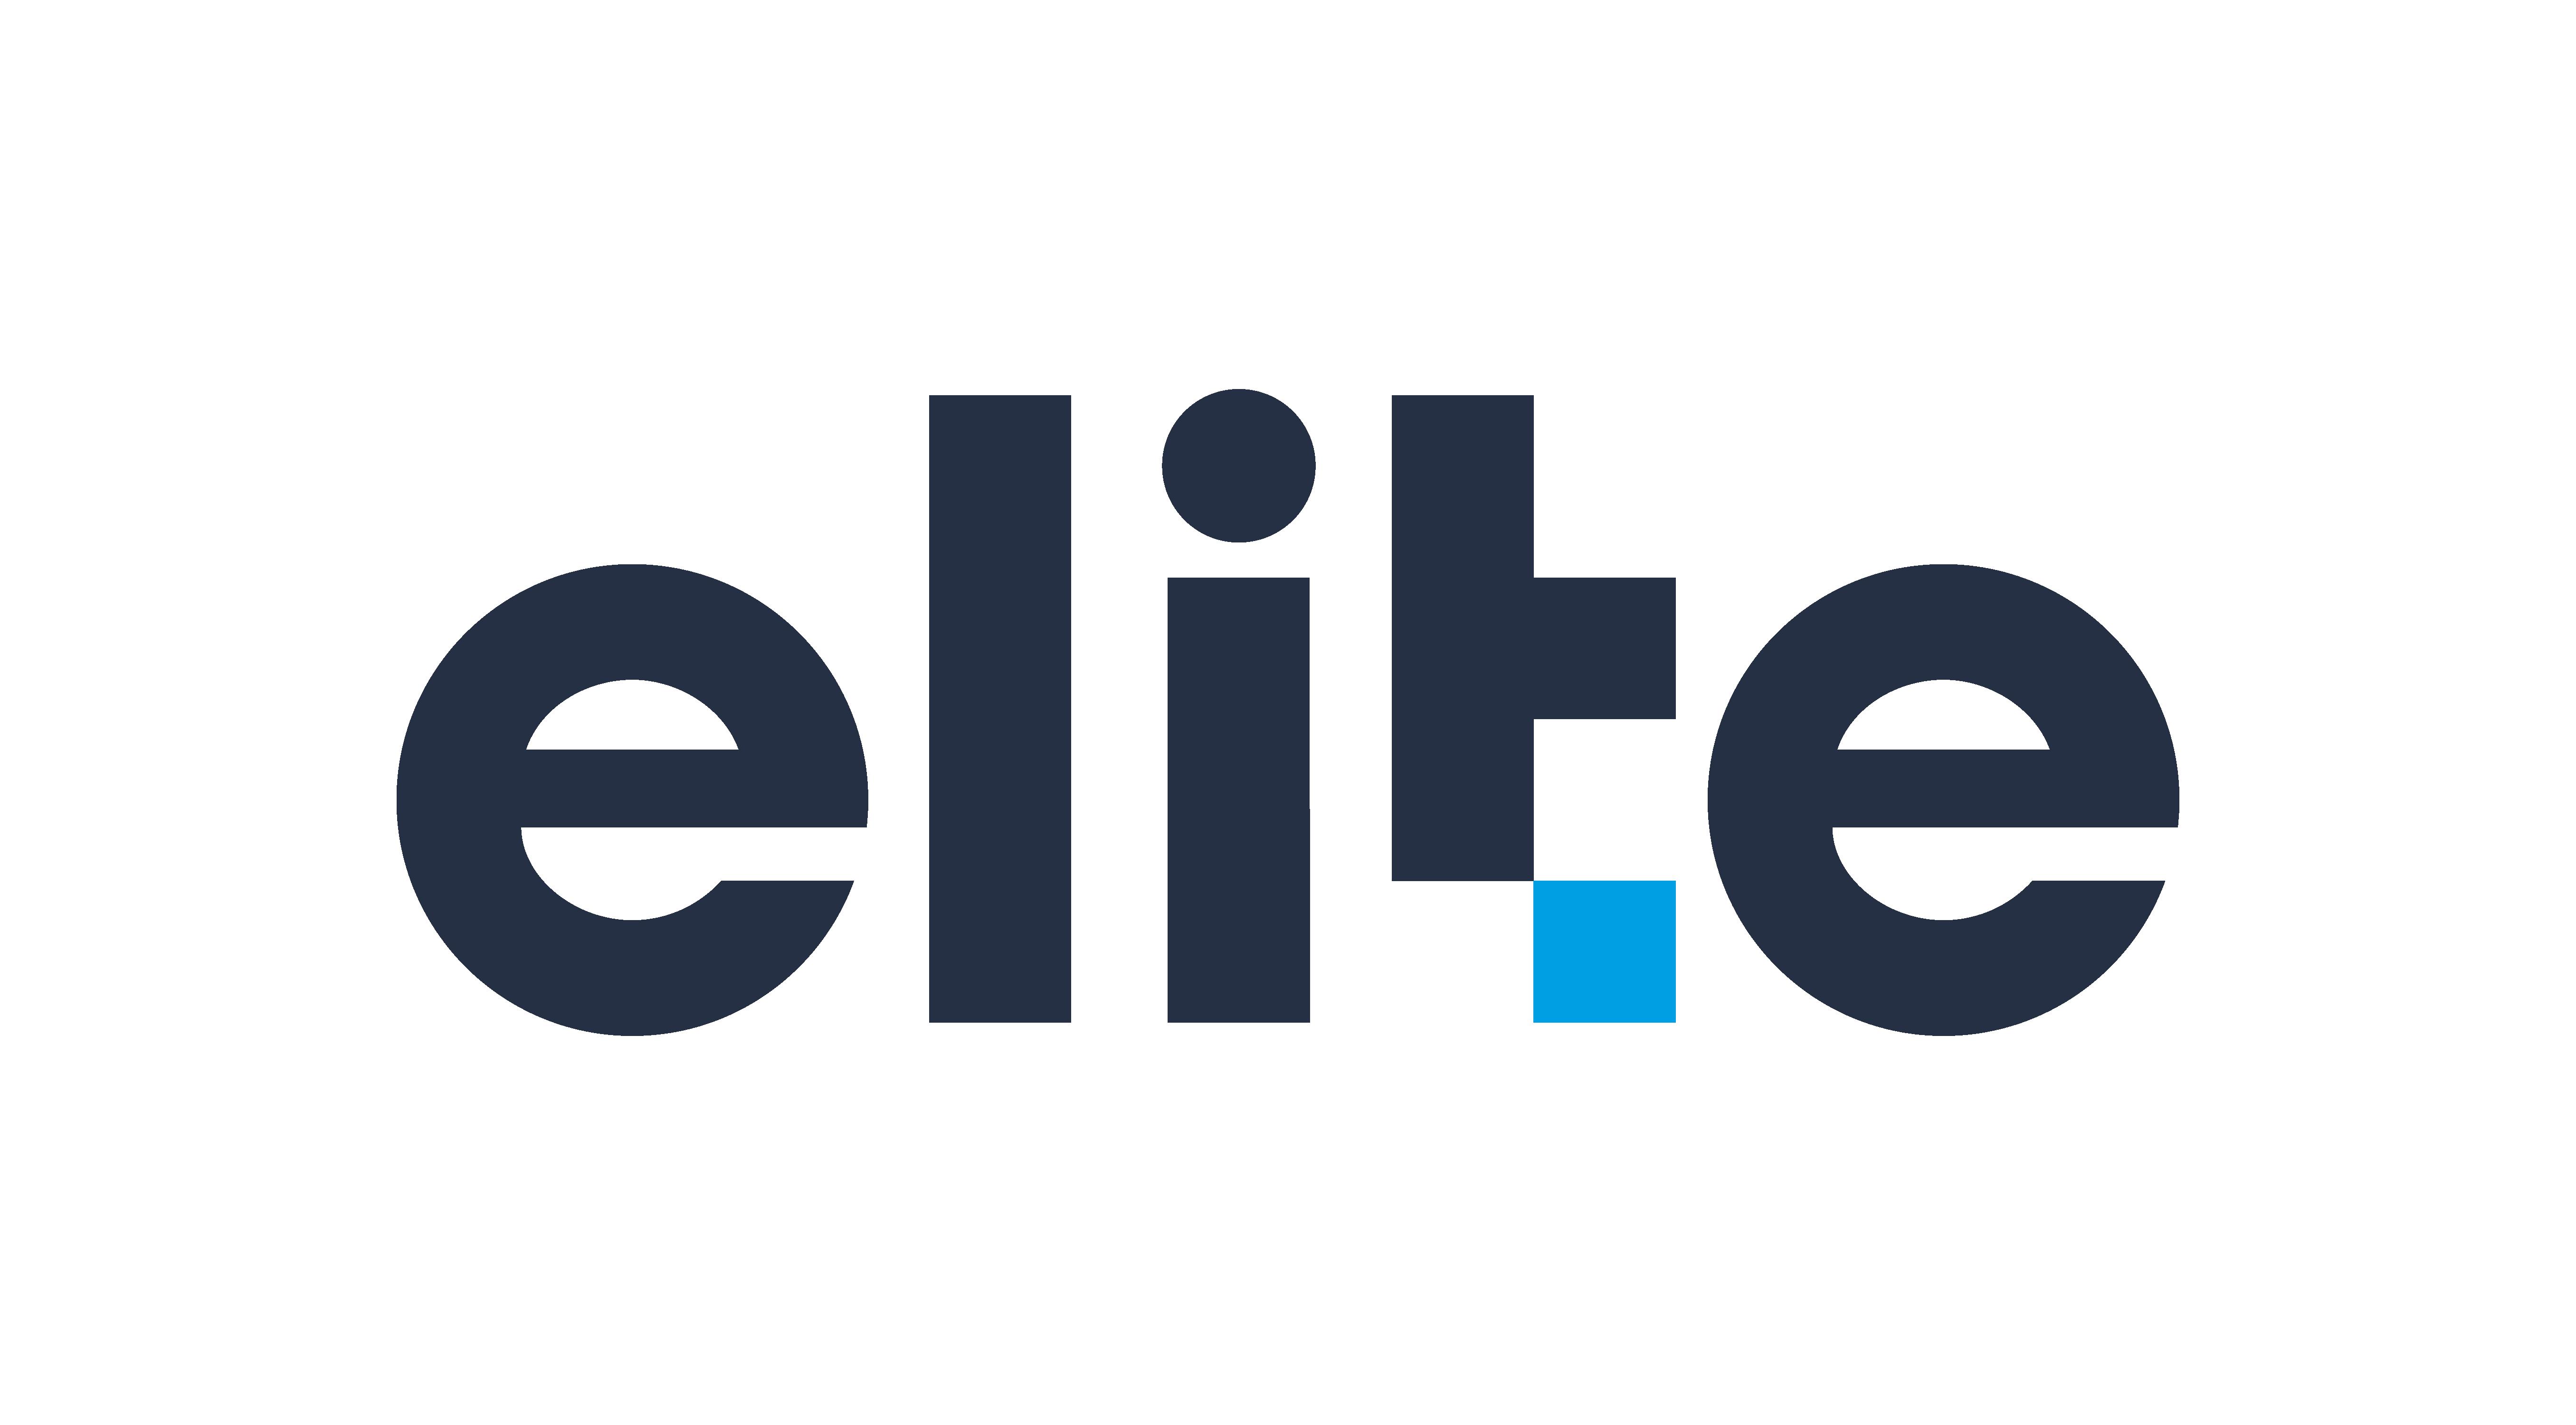 Elite_Solutions_logo image